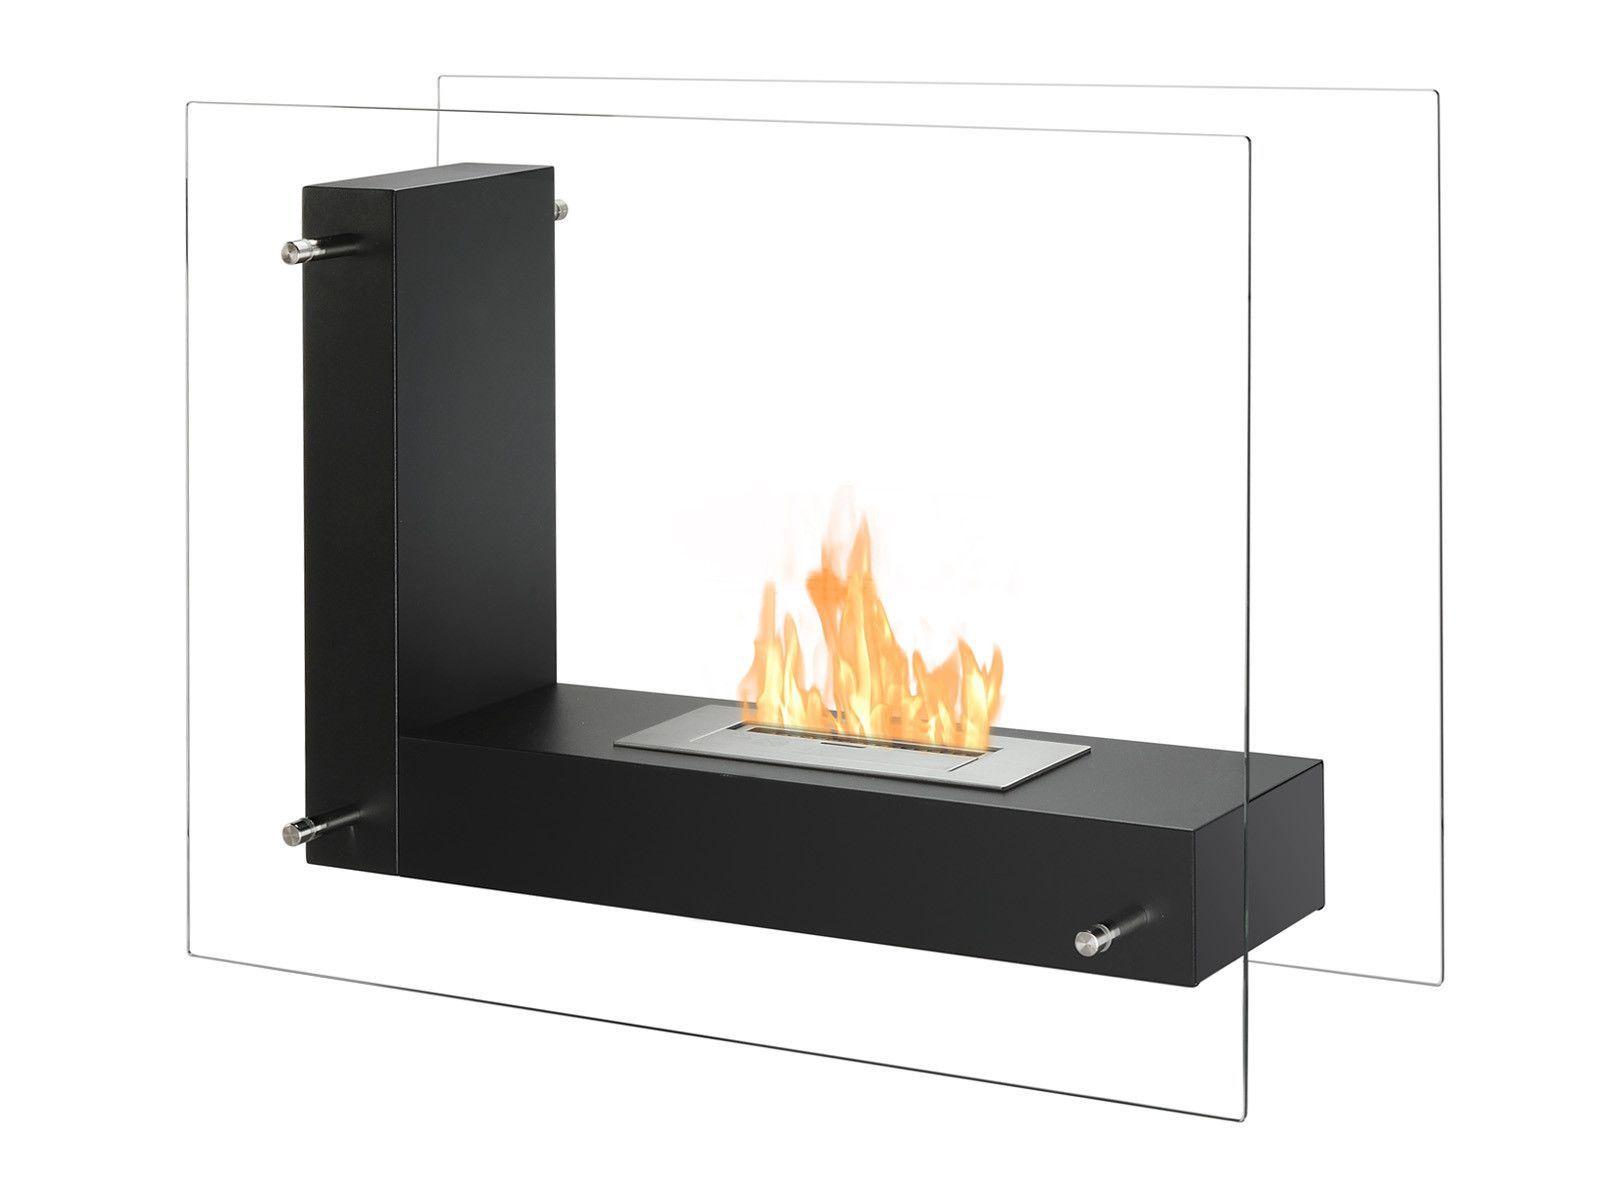 Ignis Vitrum L Black 32 Free Standing Ethanol Fireplace In Outdoor Fsf 005 Ethanol Fireplace Bioethanol Fireplace Freestanding Fireplace